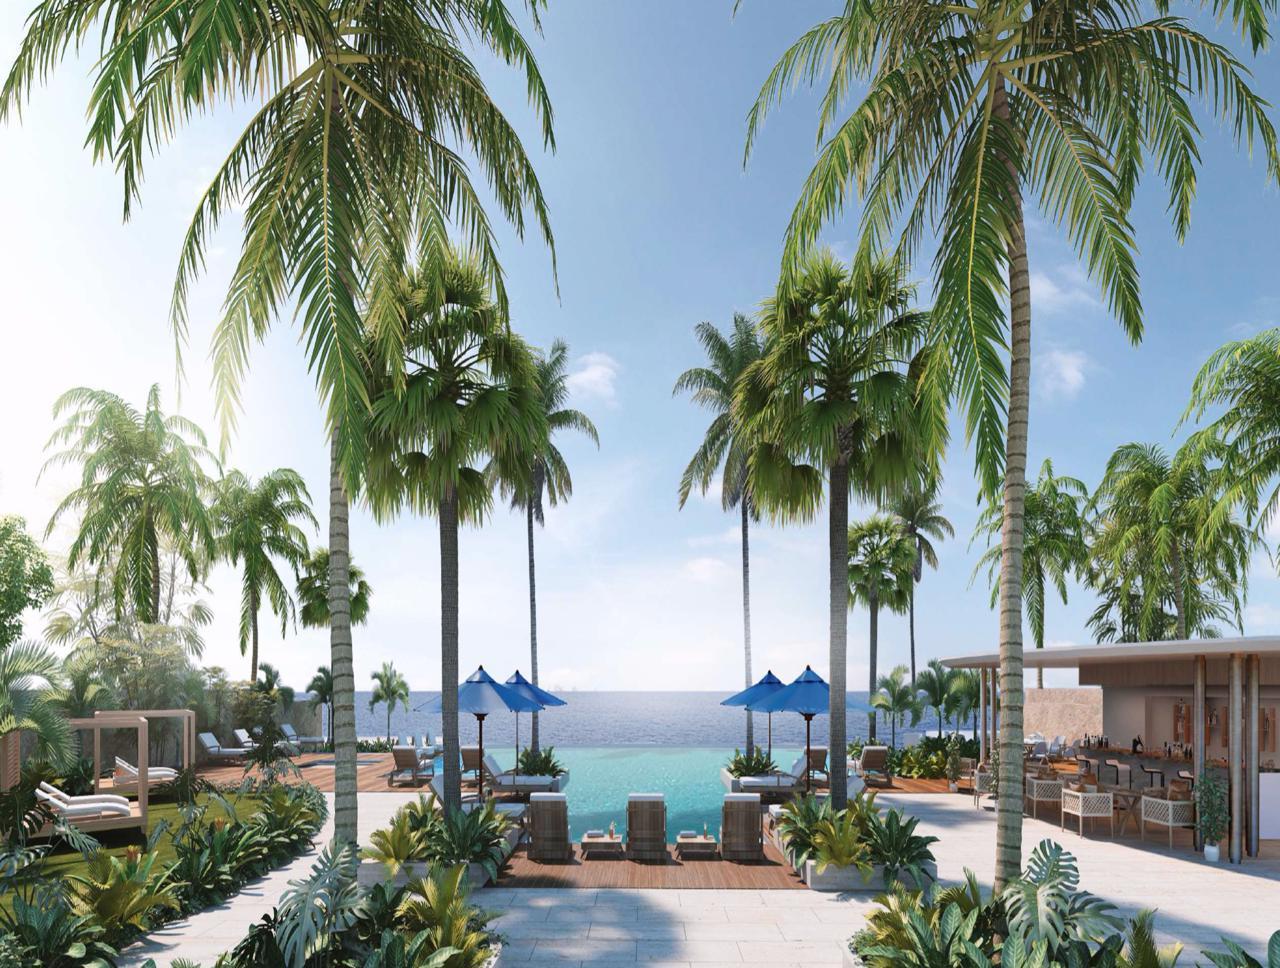 Aqualina Gated Beachfront Condo Nassau